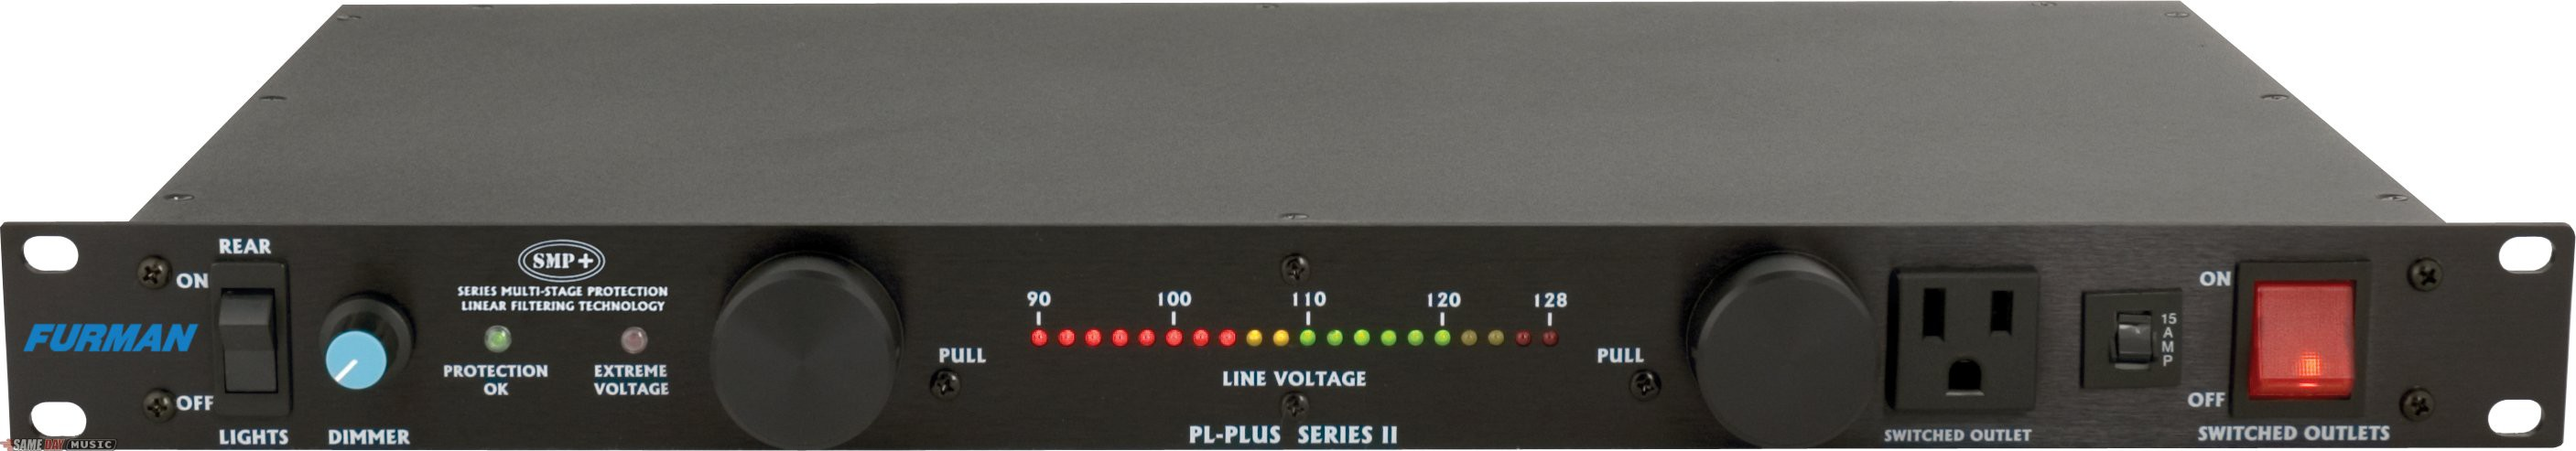 Furman Classic Series PL Plus CE Power Conditioner